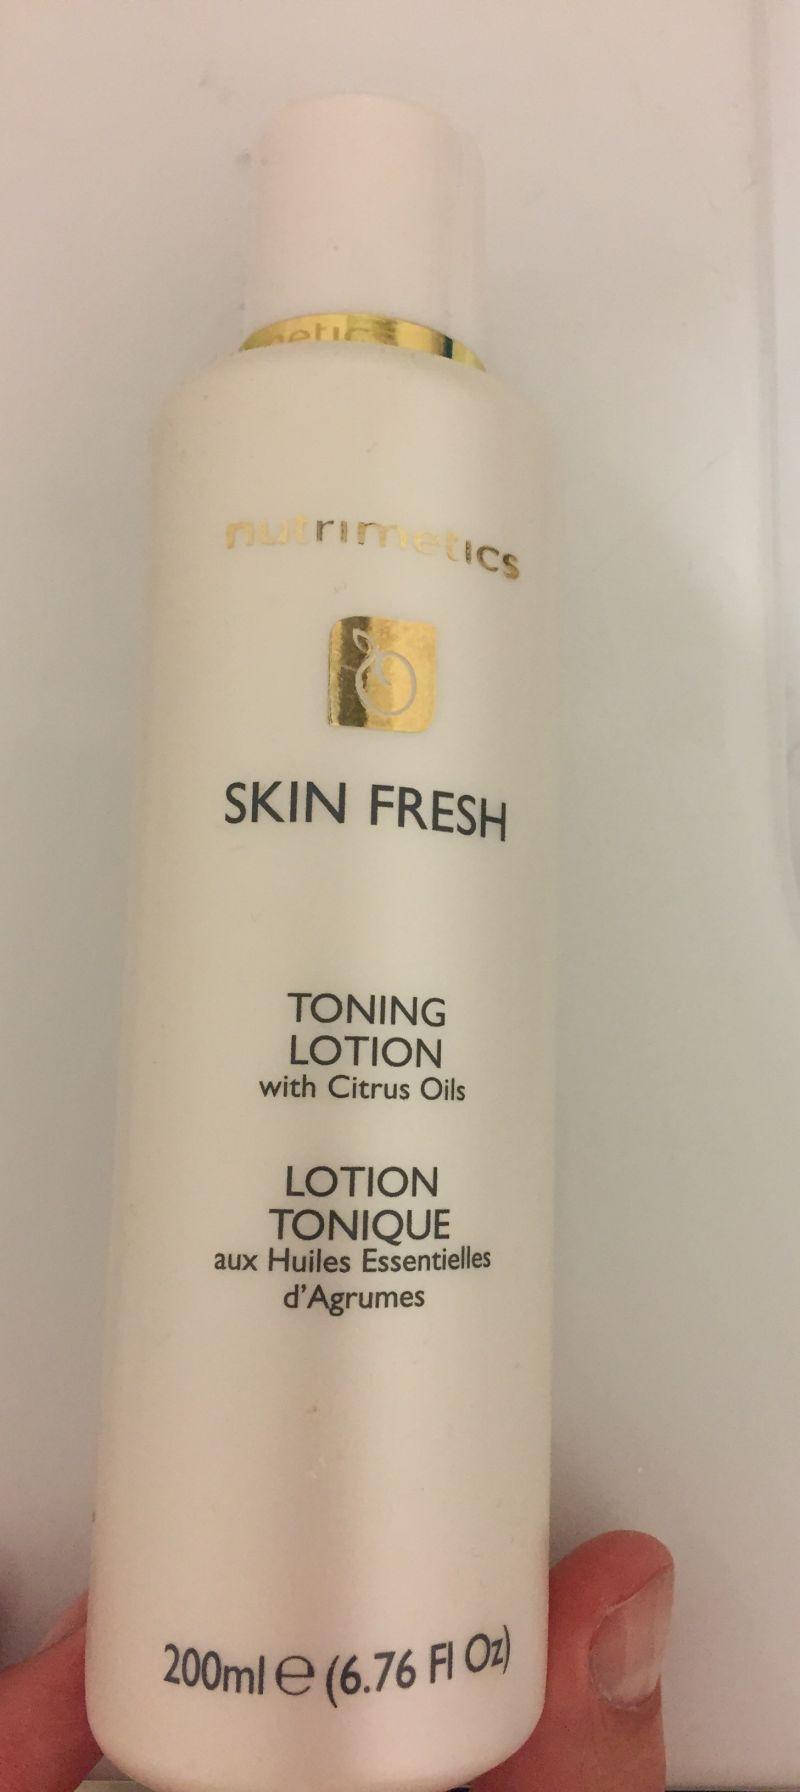 Swatch Skin fresh, Nutrimetics